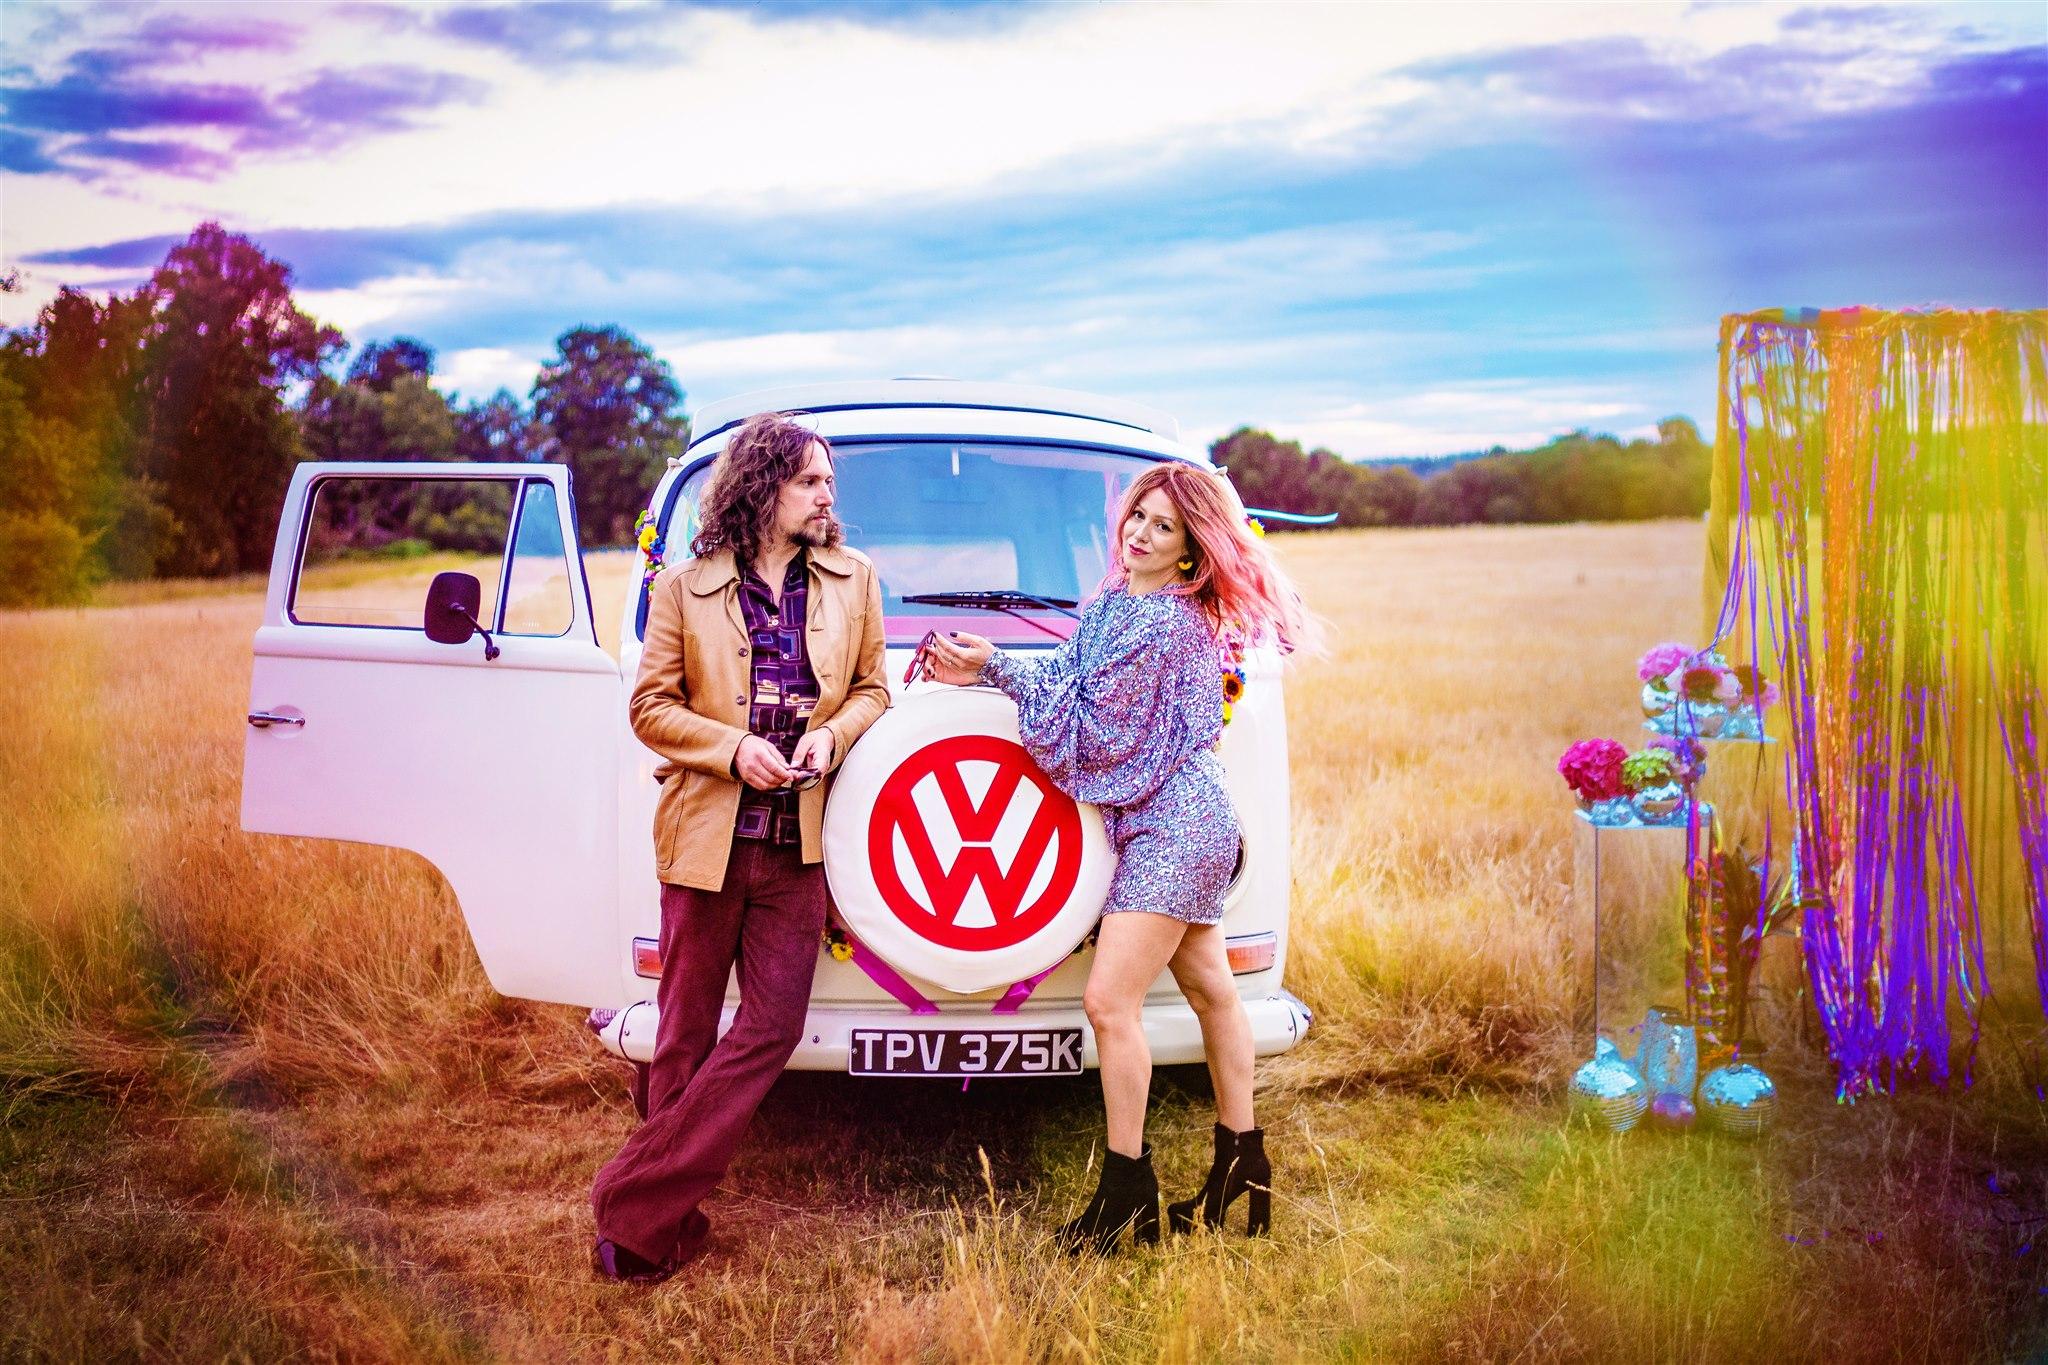 colourful bohemian wedding - 70s wedding - campervan wedding - hippie wedding - fun elopement